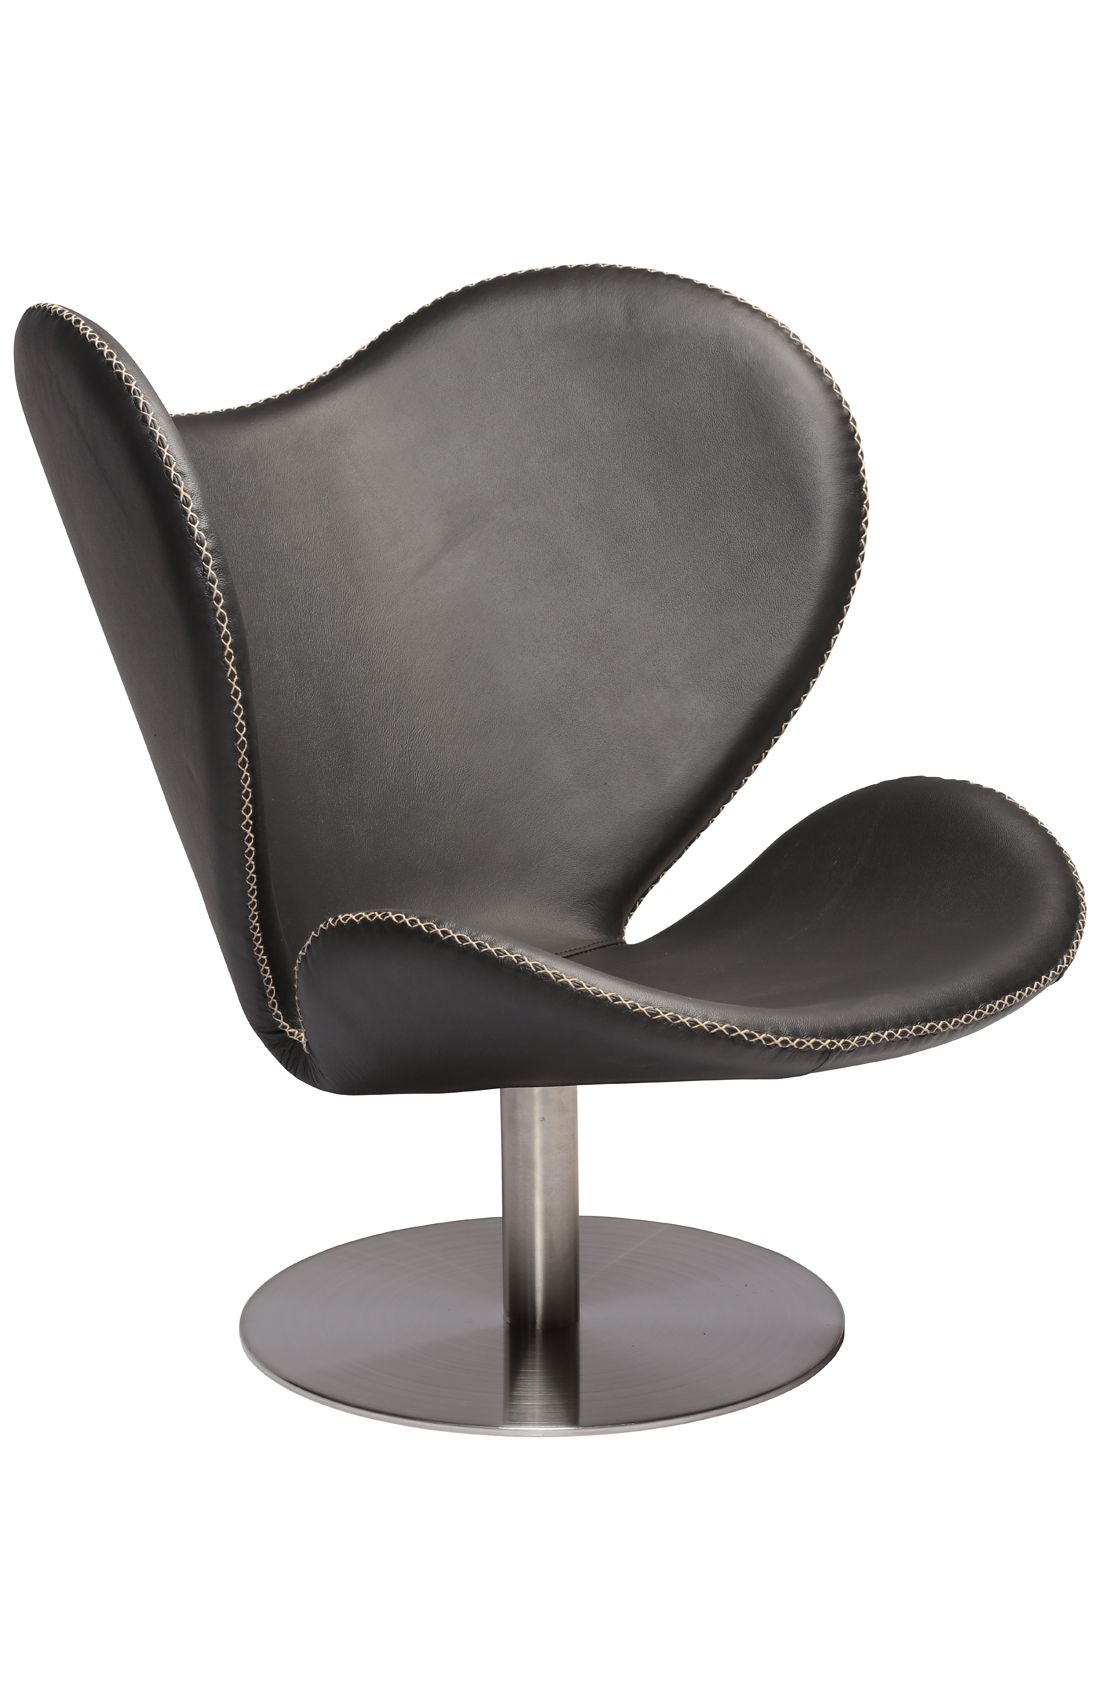 Butterfly lounge chair danishdesign newclassic stylehome danishfurniture homedecor danform classicfurniture metalandwood